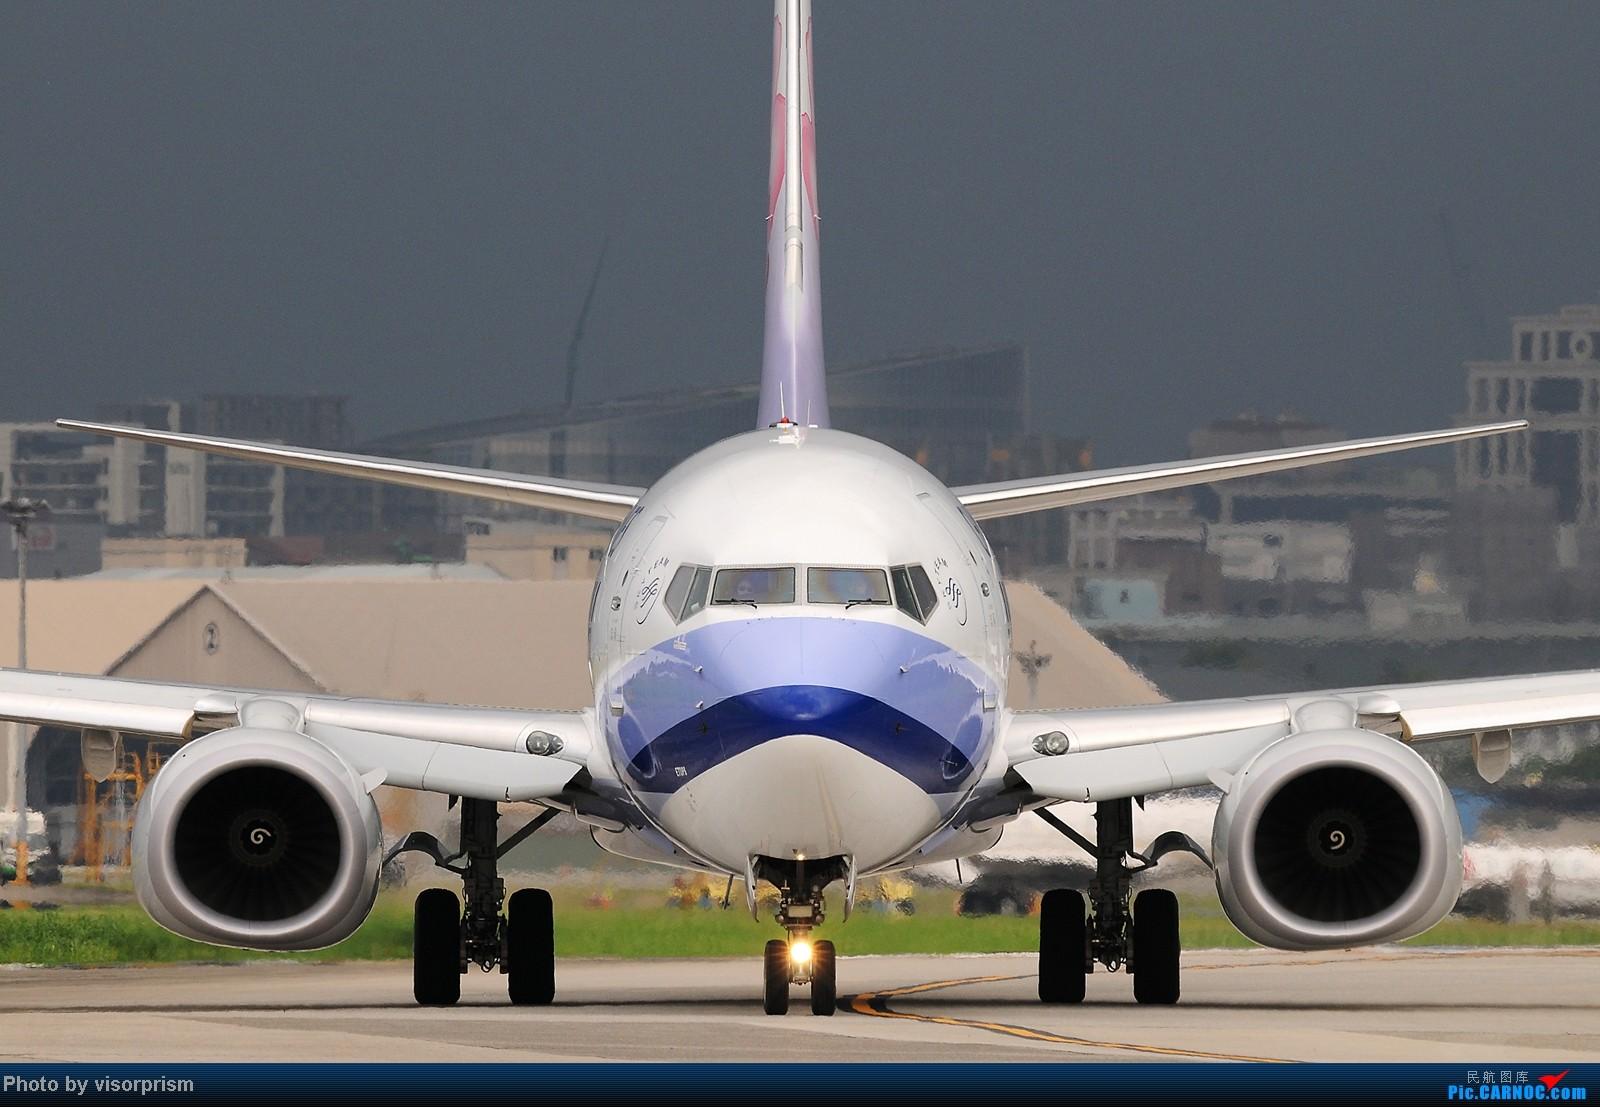 Re:[原创][台北飛友會]SIGMA APO 500mm F4.5 DG HSM 鏡頭測試 BOEING 737-8Q8 B-18651 中国台北松山机场